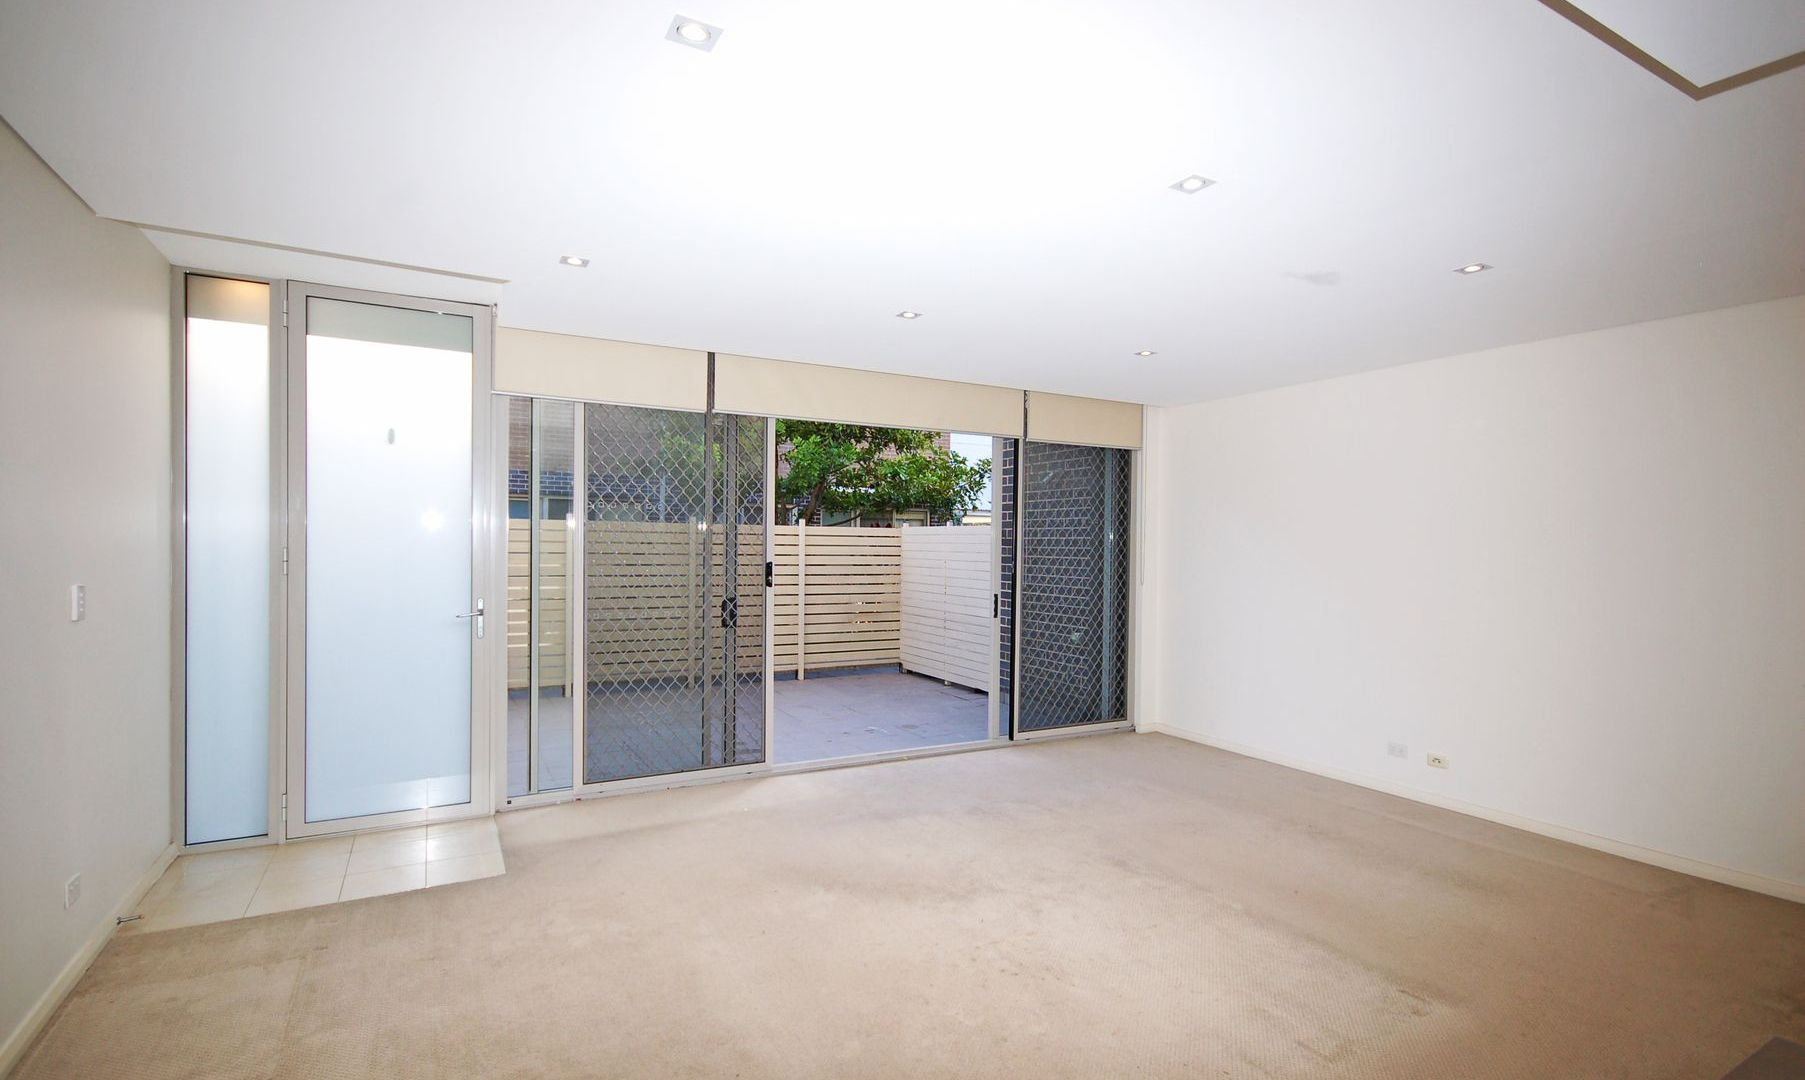 2/137 Willarong Rd, Caringbah NSW 2229, Image 1